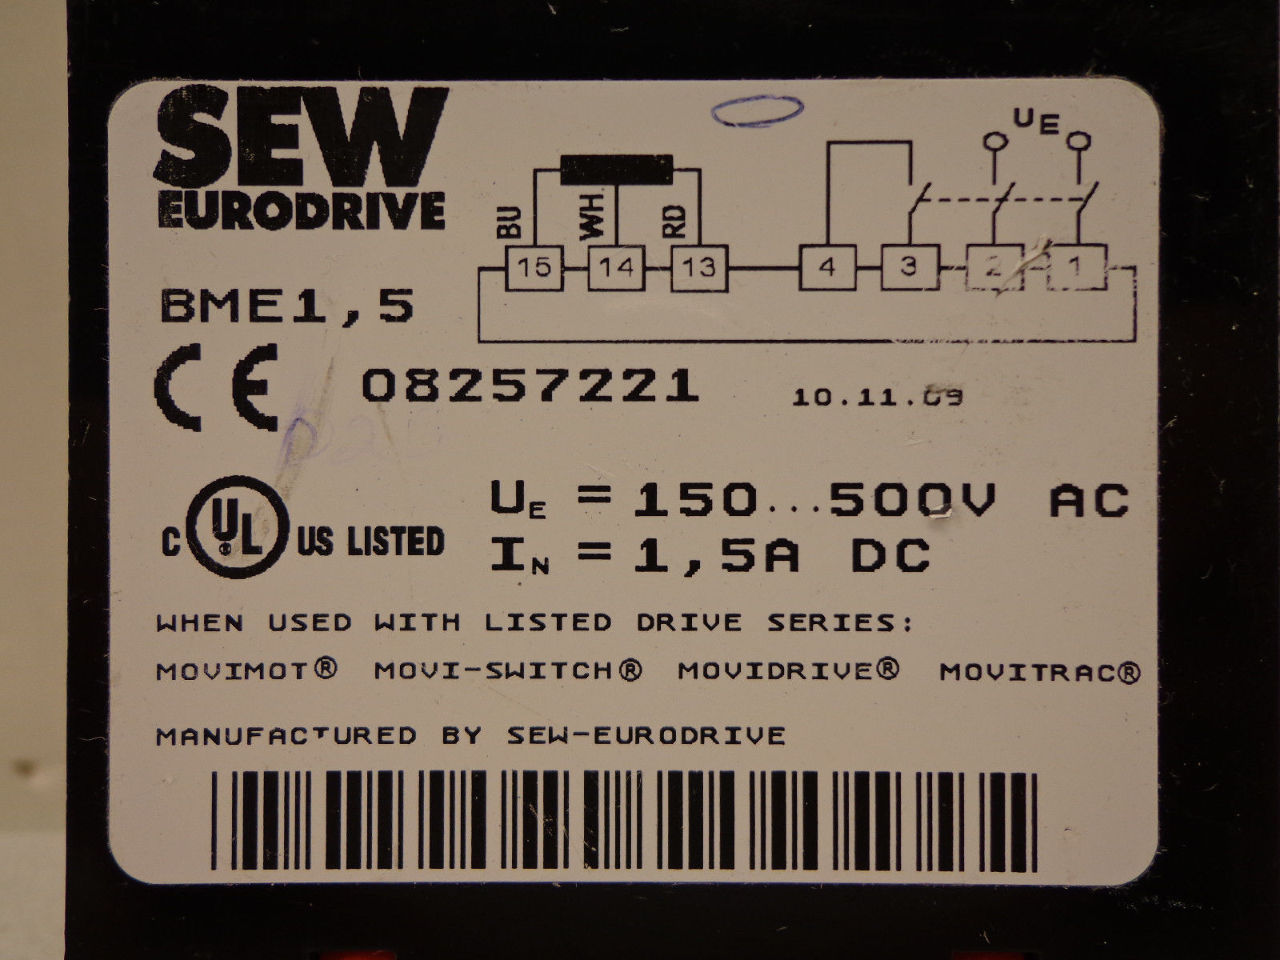 Sew Eurodrive Wiring Diagram Movitrac Motor Ke Hecho